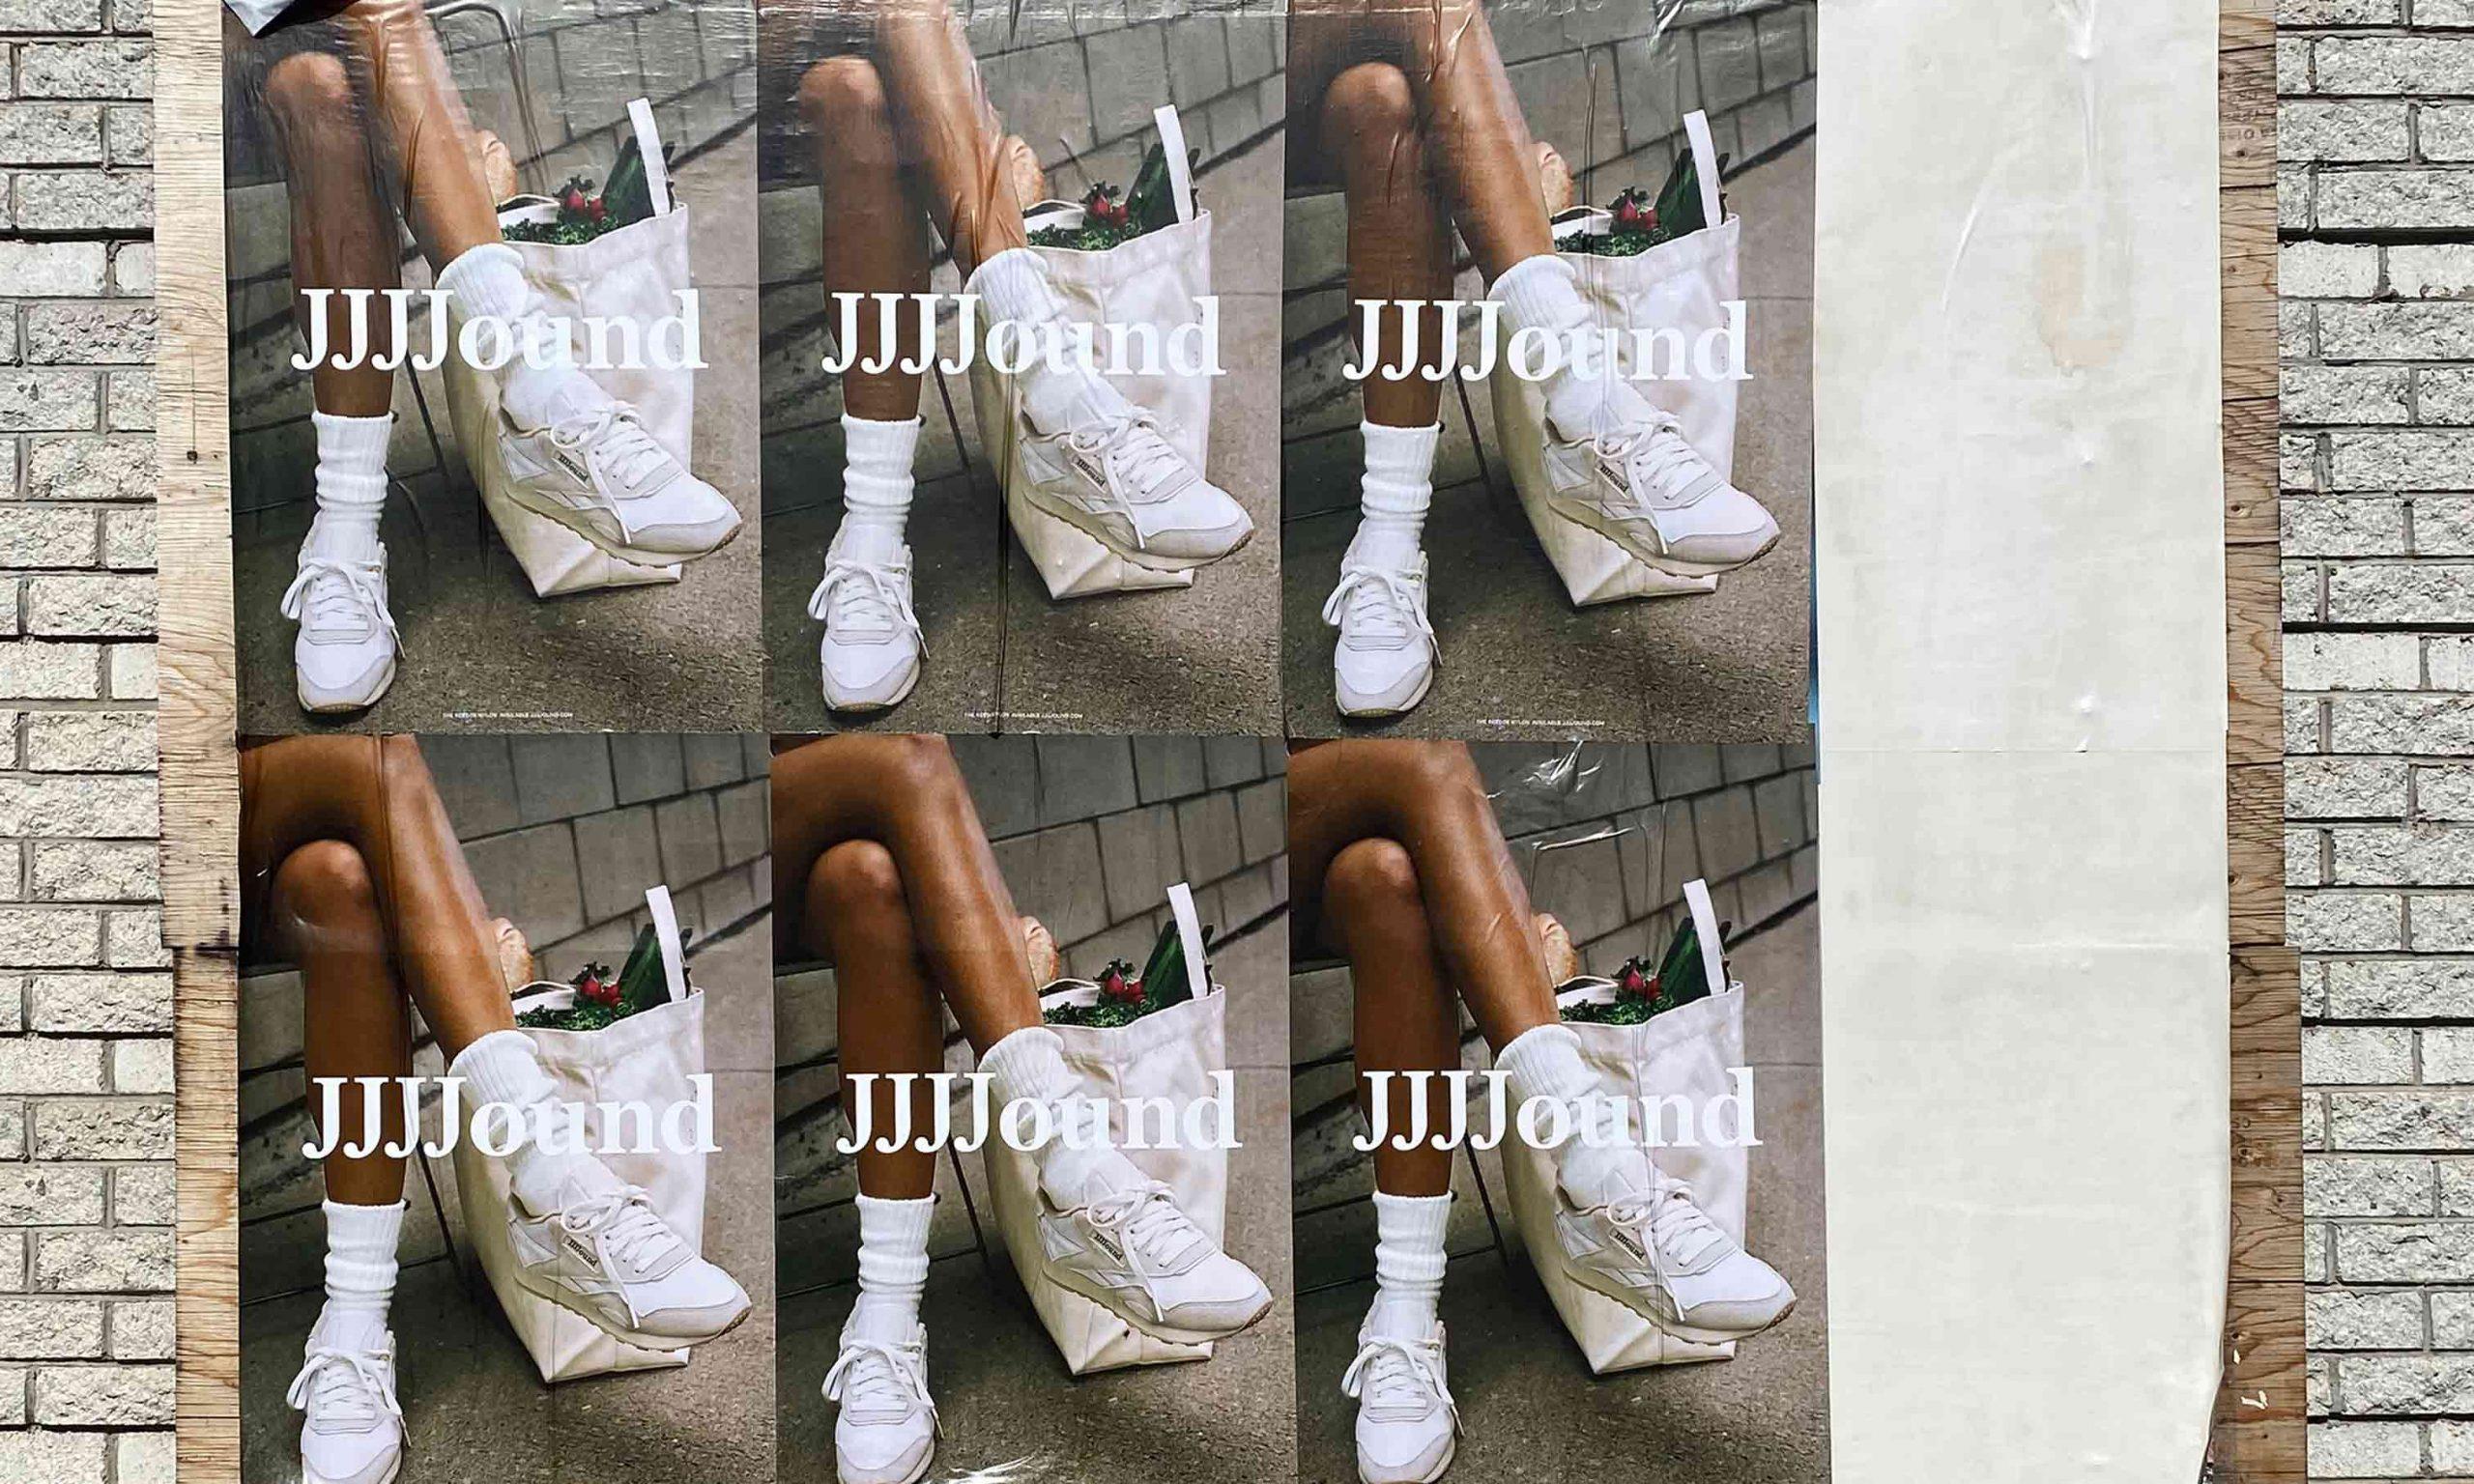 JJJJound x Reebok Classic Leather Nylon 国内发售信息公布